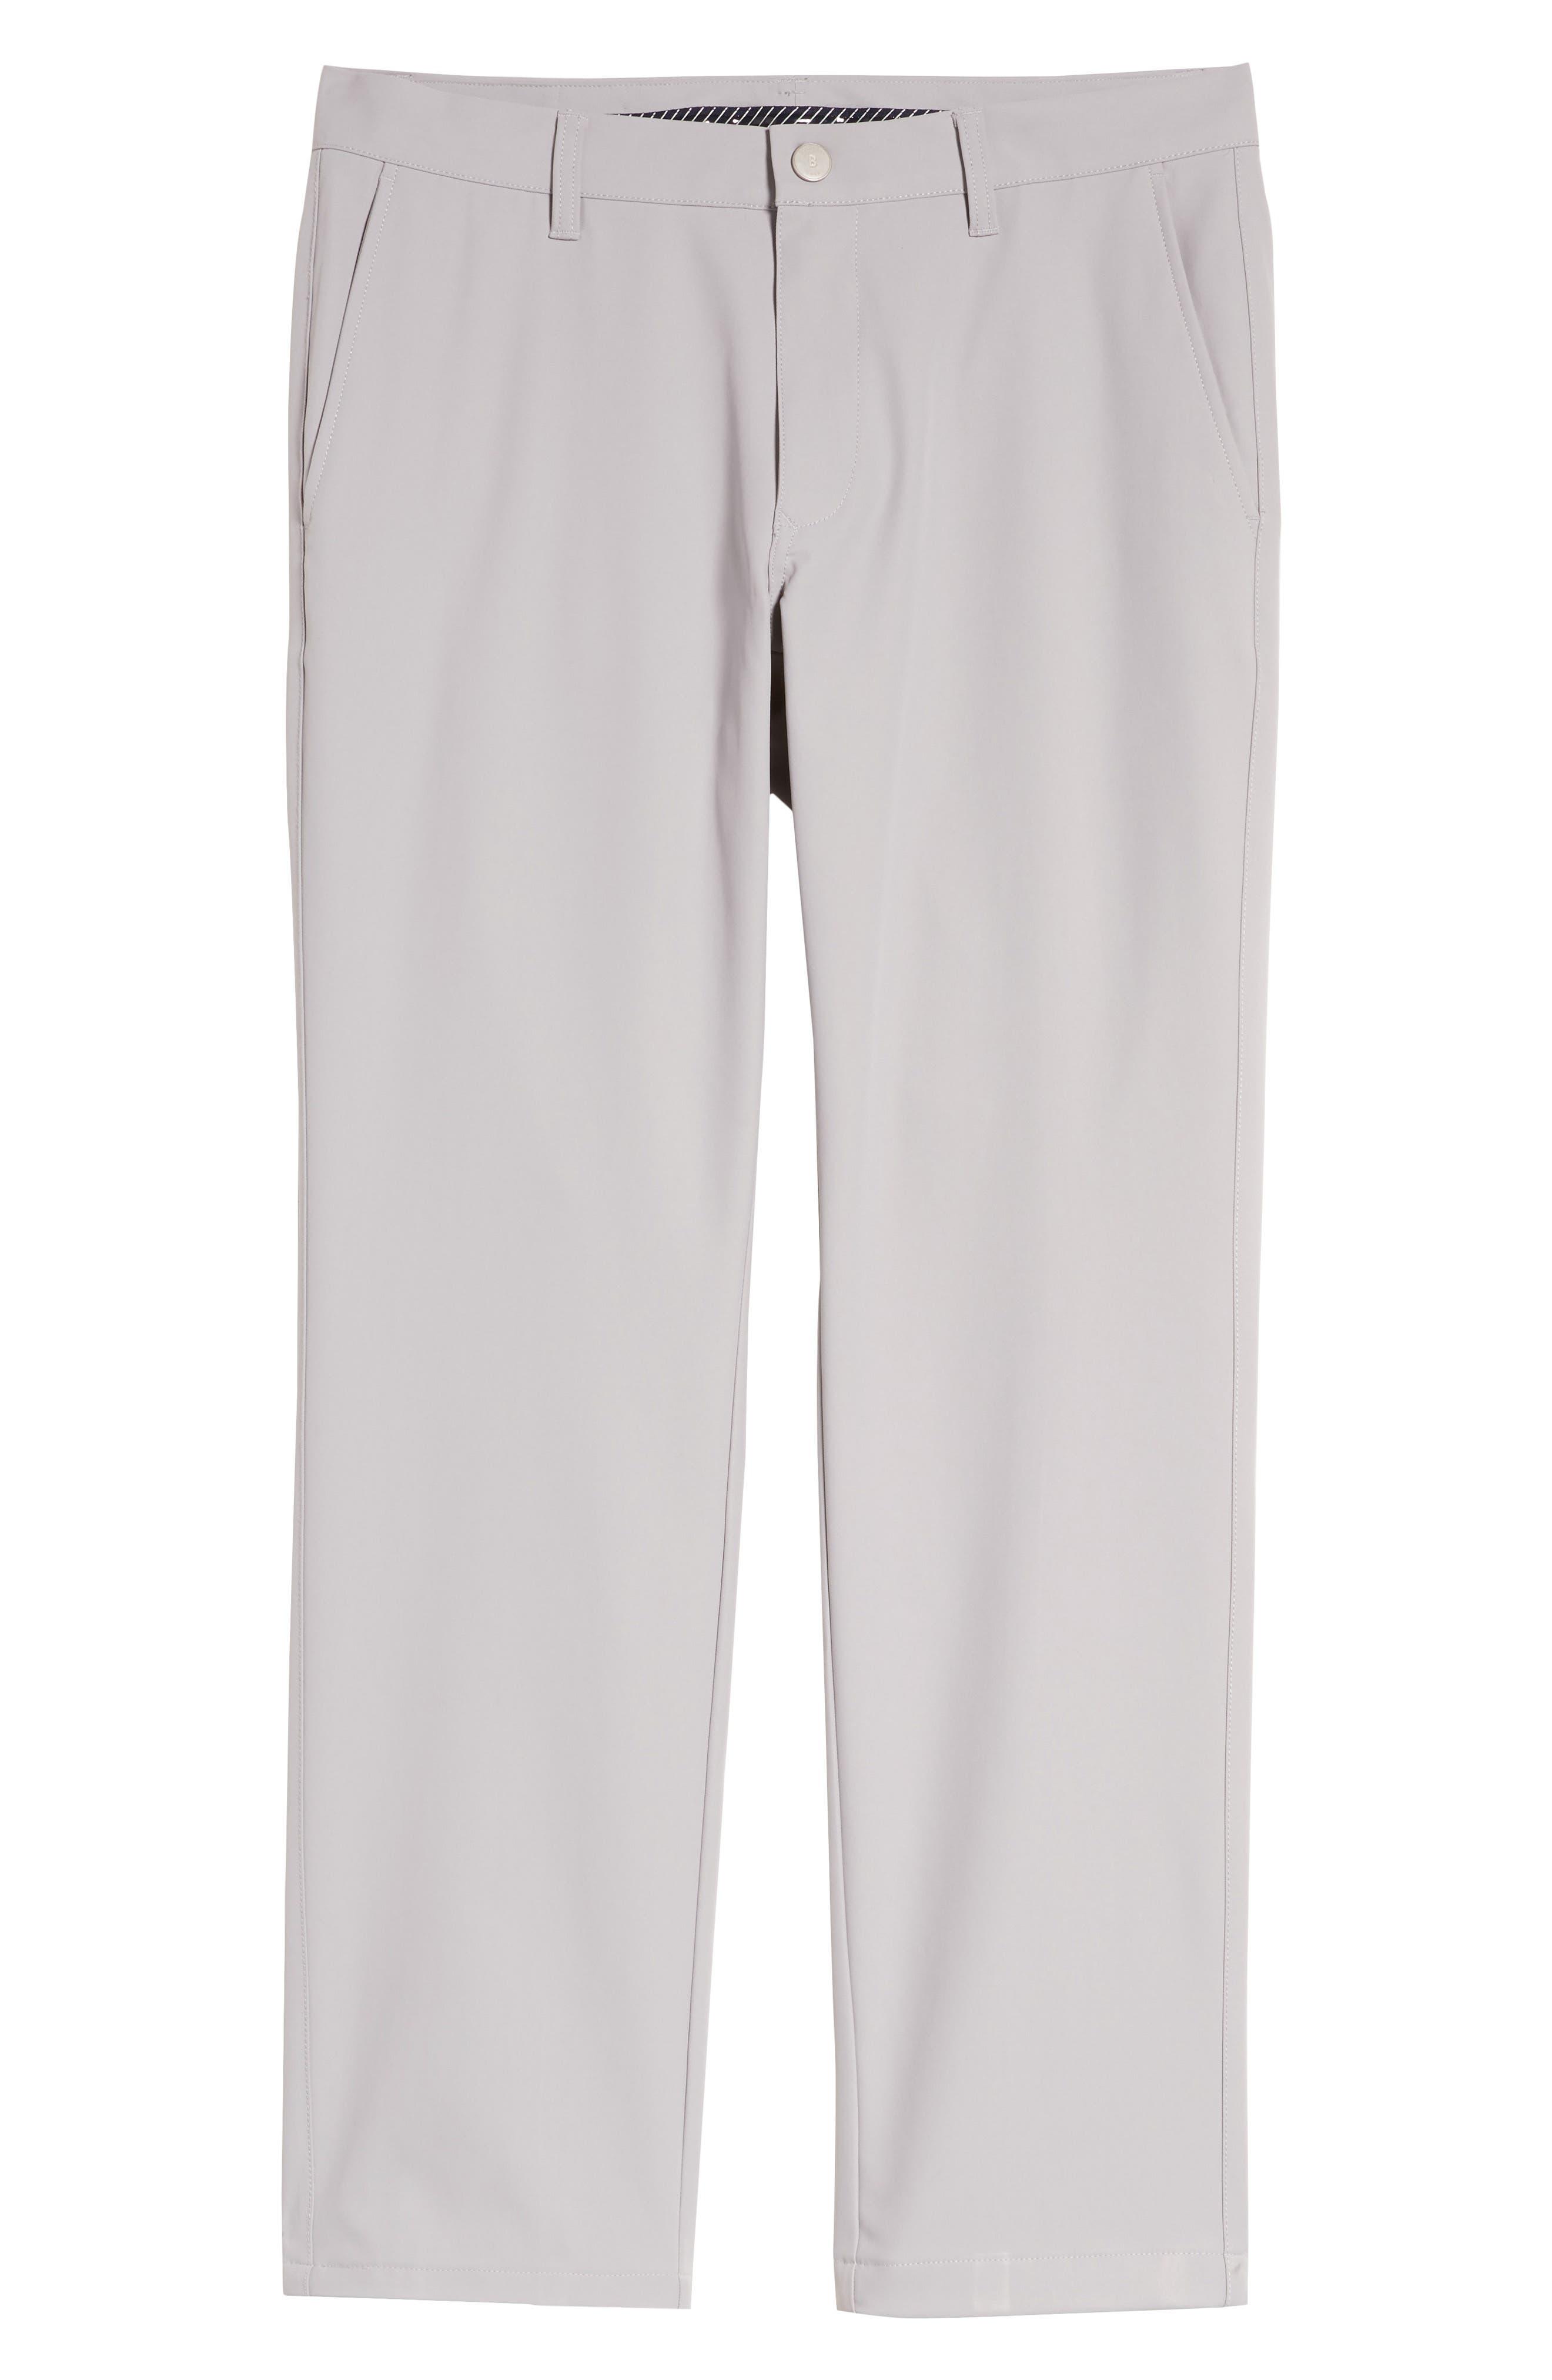 Highland Slim Fit Golf Pants,                             Alternate thumbnail 6, color,                             LIGHT GREY